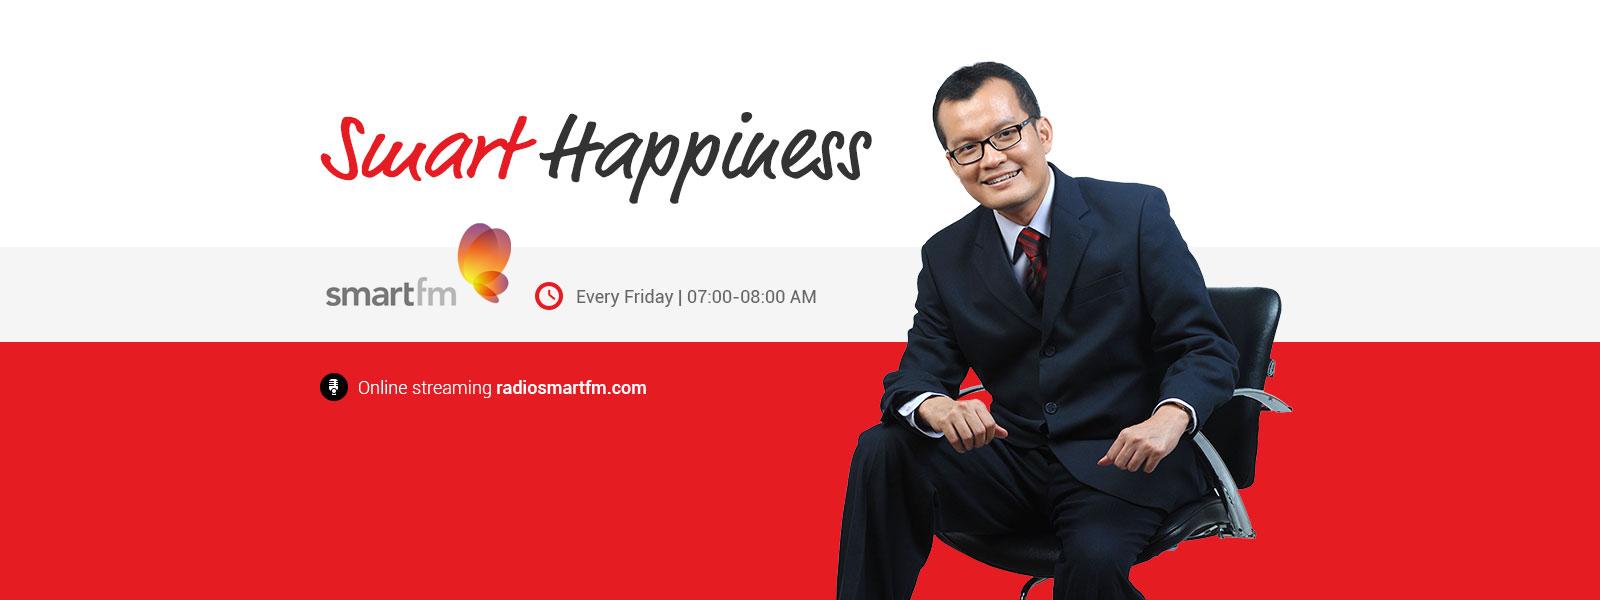 smart-happiness-home-slider1